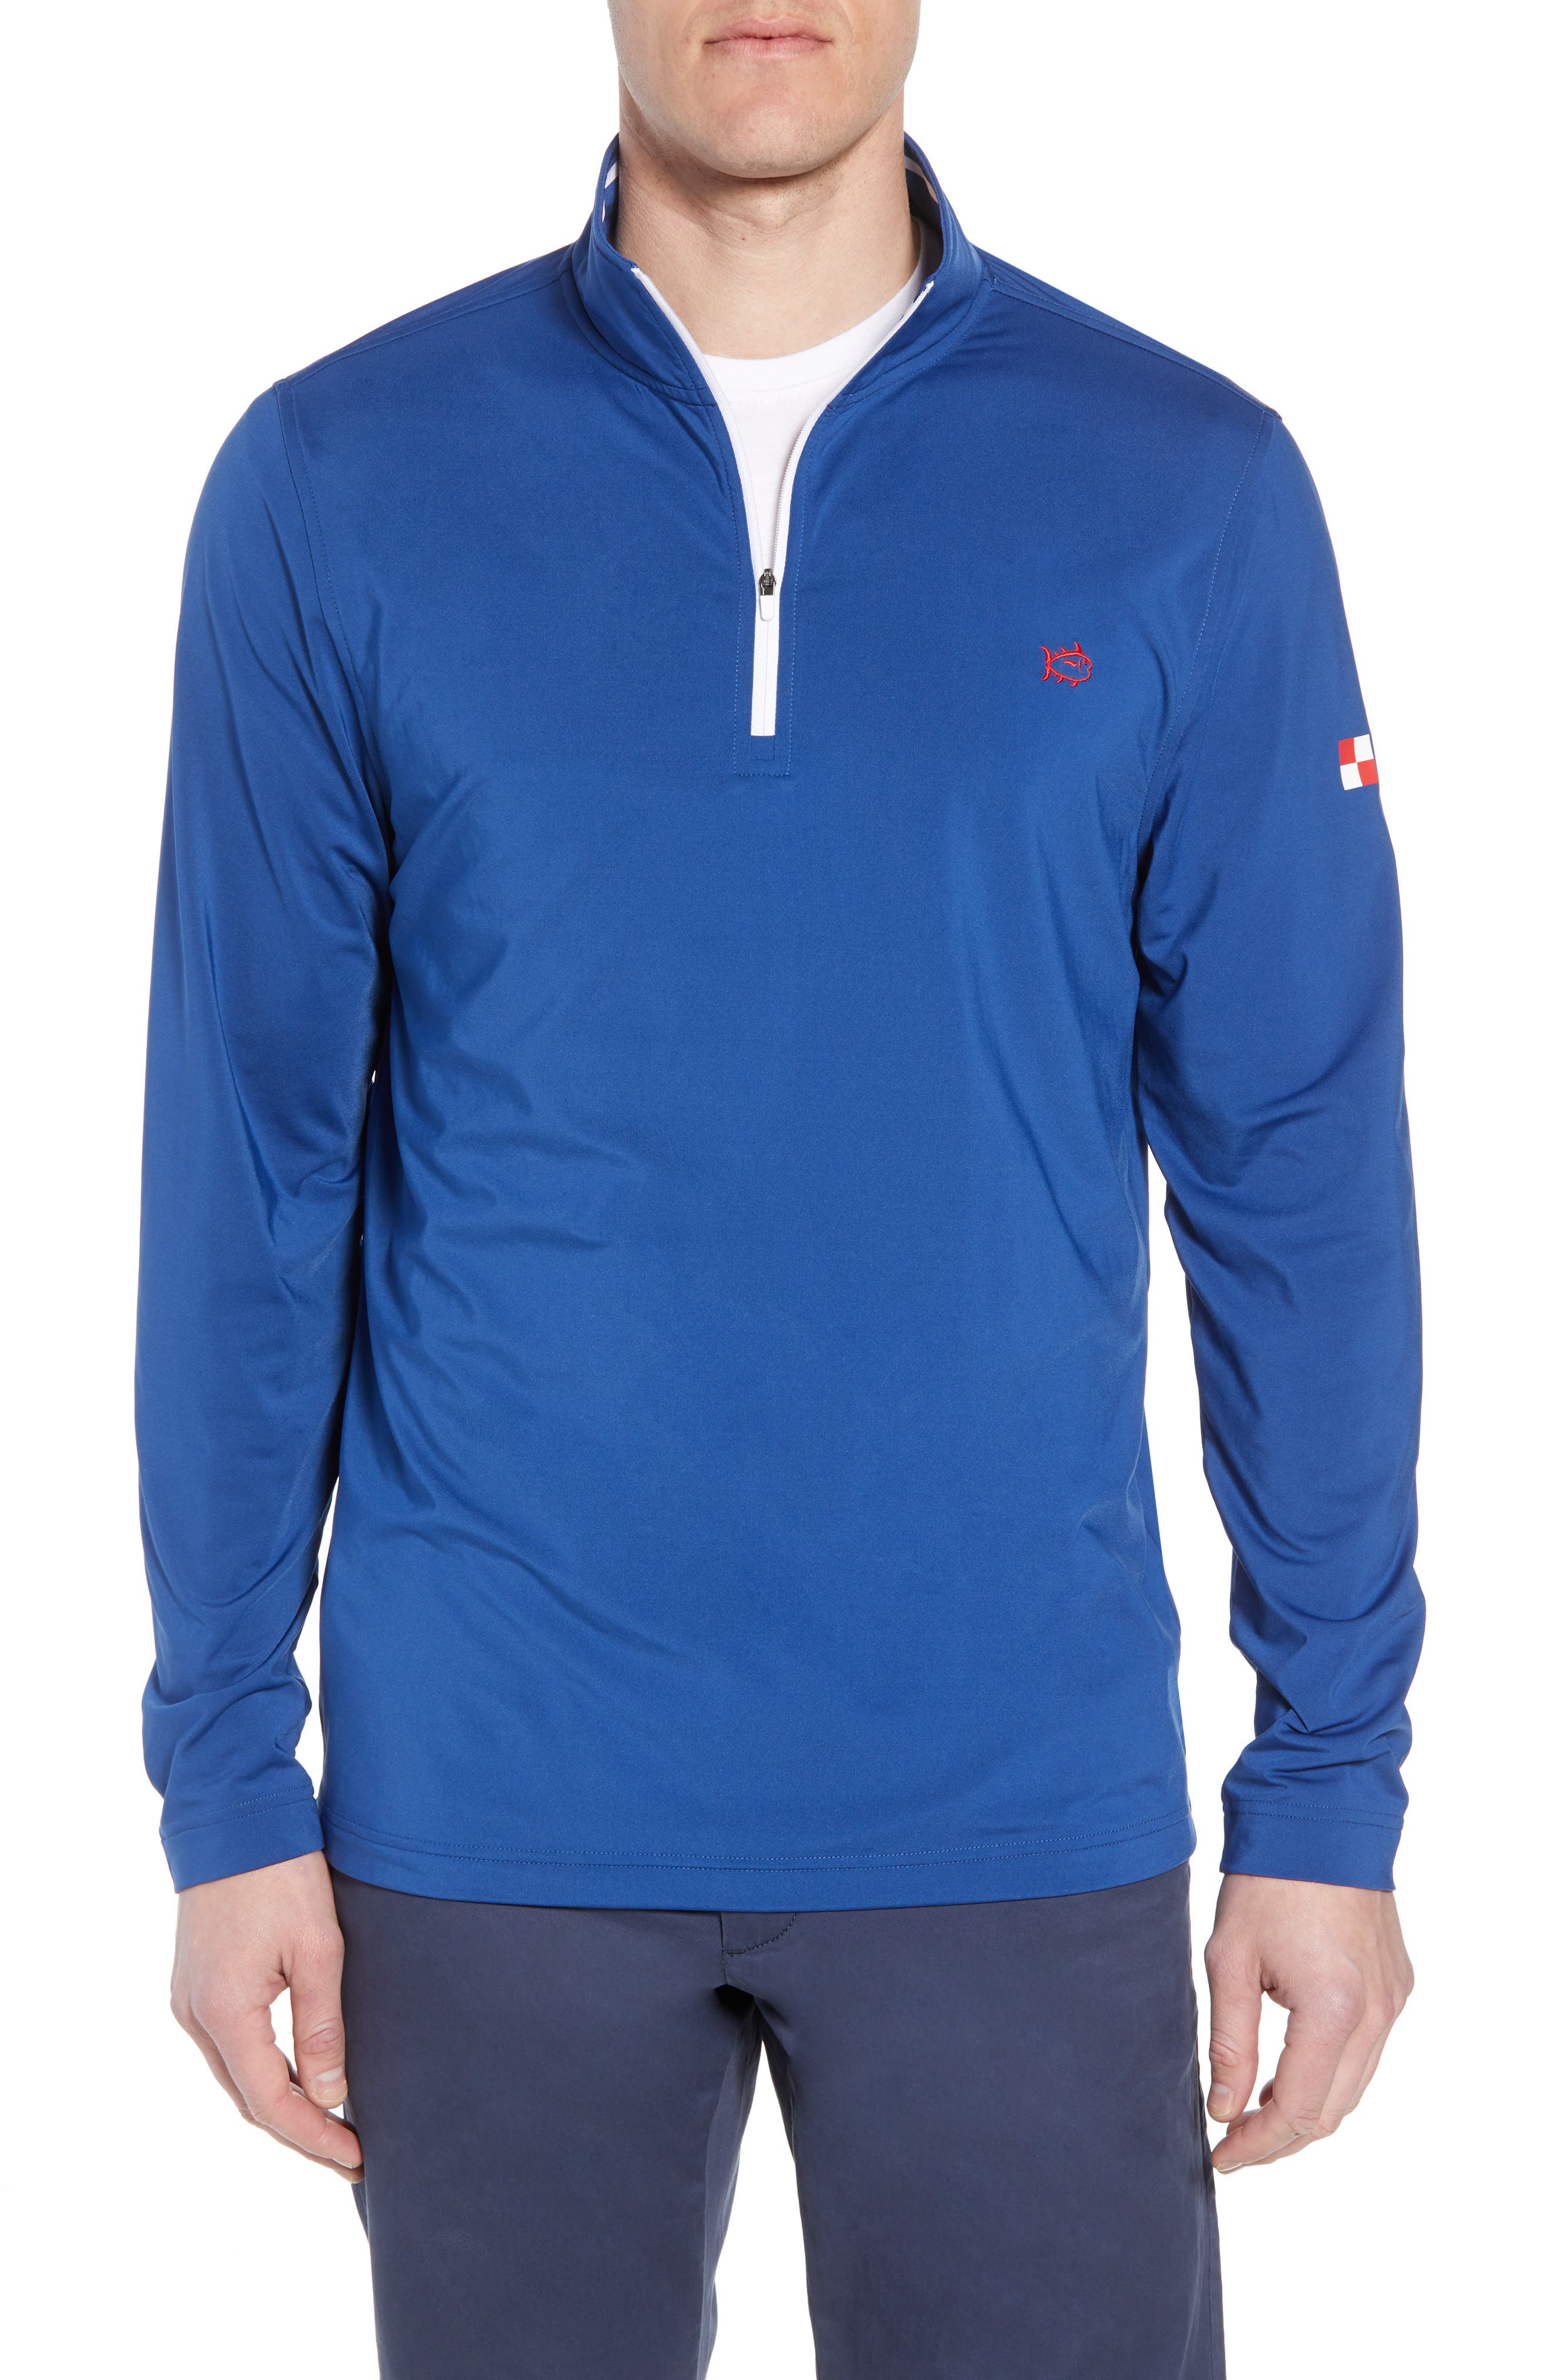 USA Performance Quarter-Zip Pullover,                             Main thumbnail 1, color,                             Blue Lake